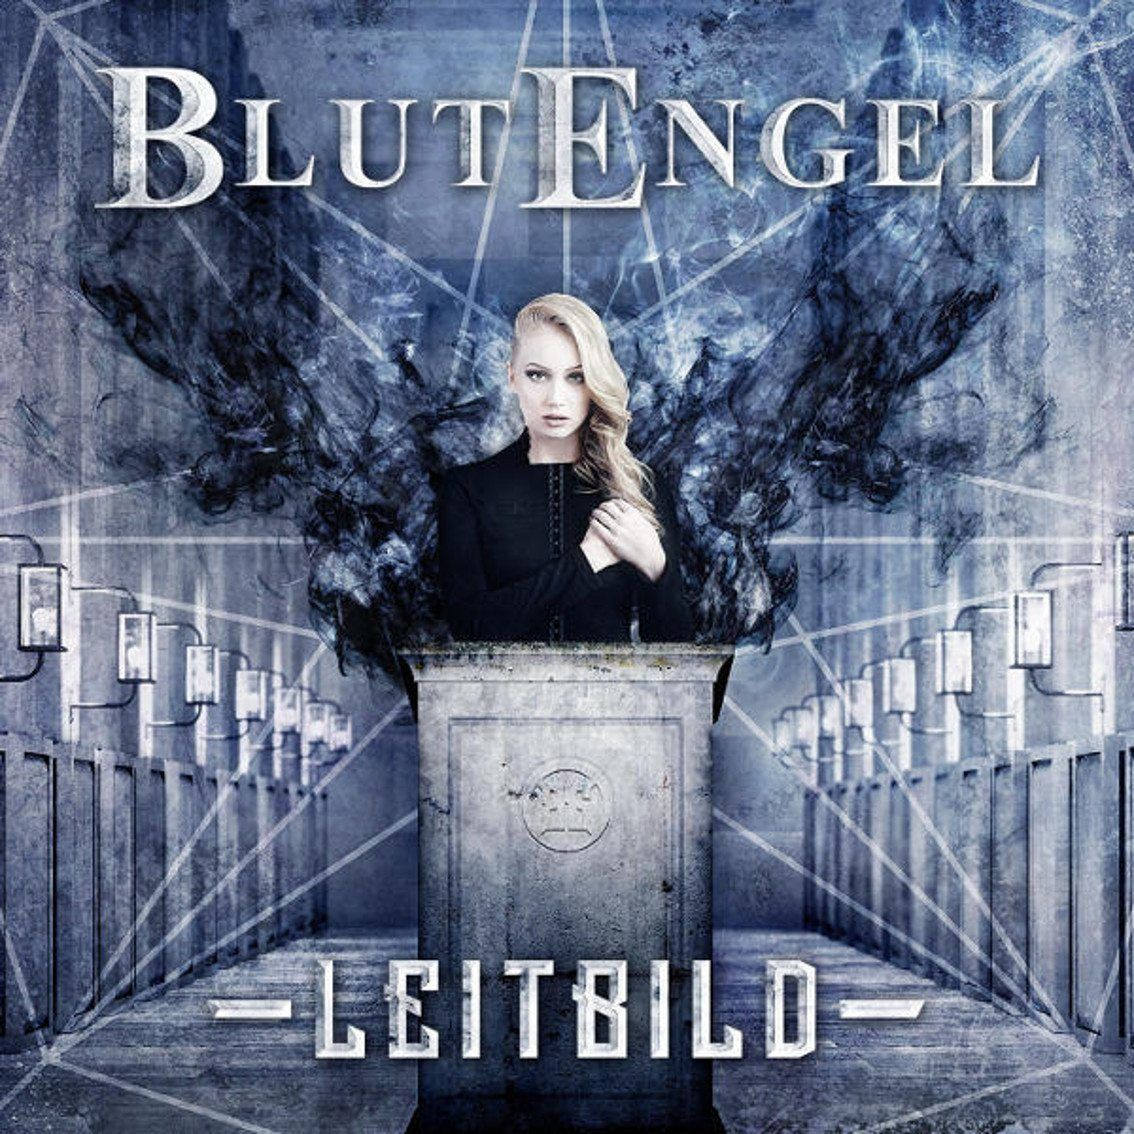 Full details new Blutengel album 'Leitbild' released - boxset, vinyl, ...